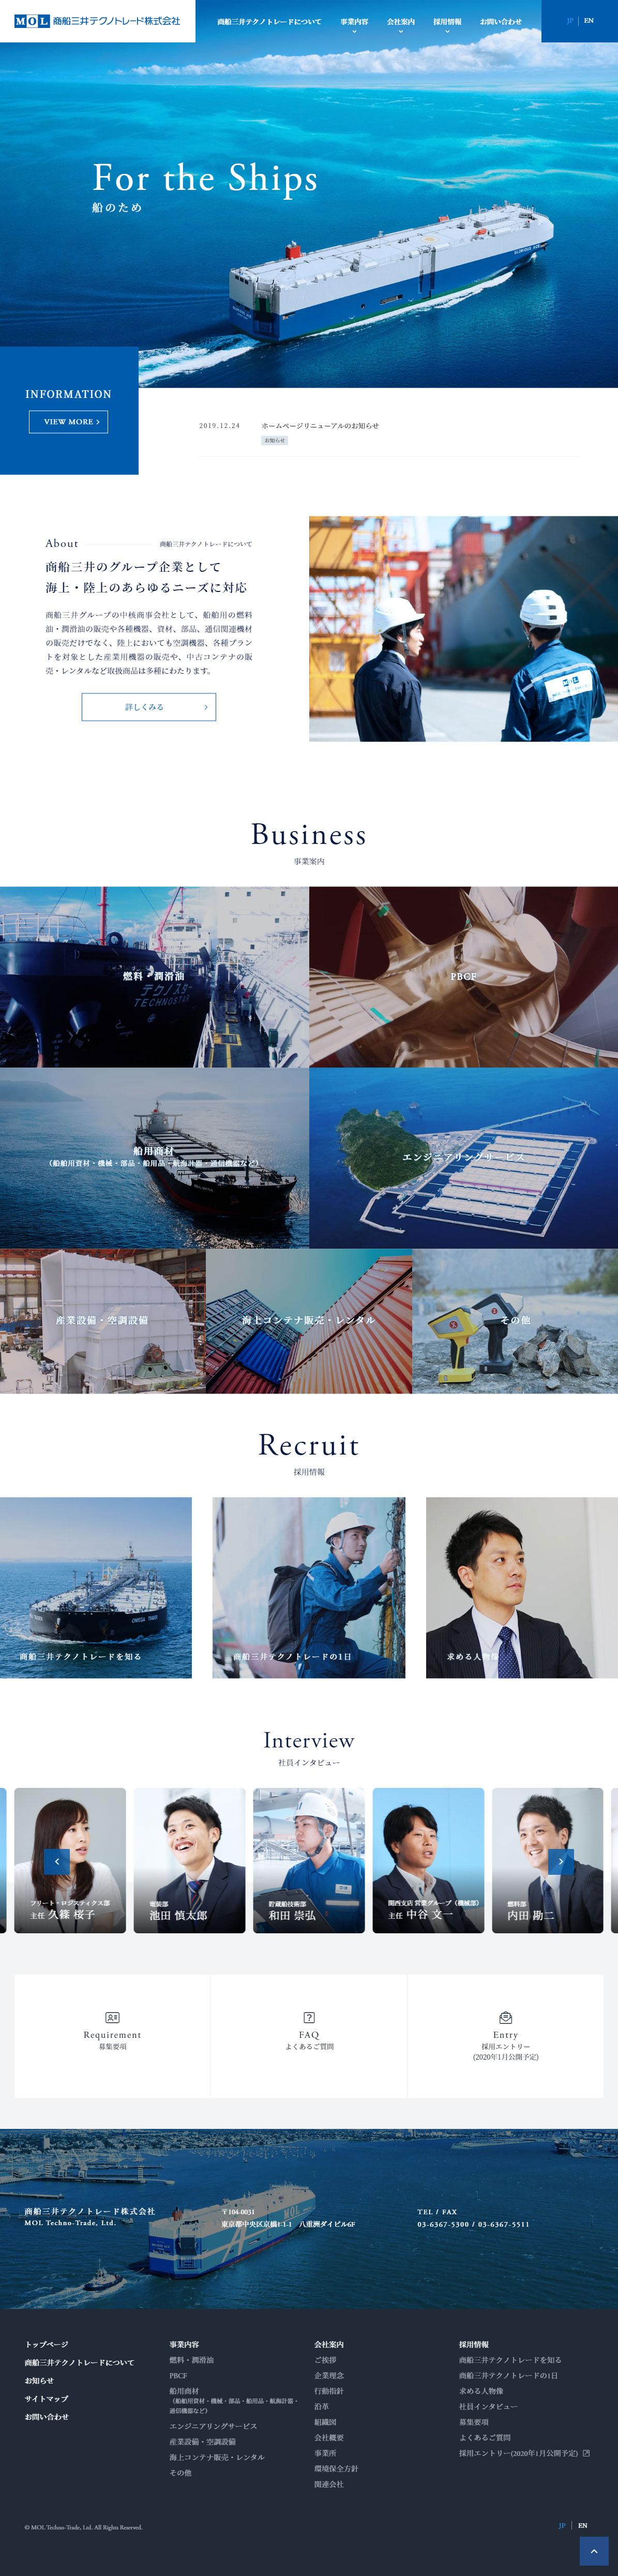 MOLTech 商船三井テクノトレード株式会社